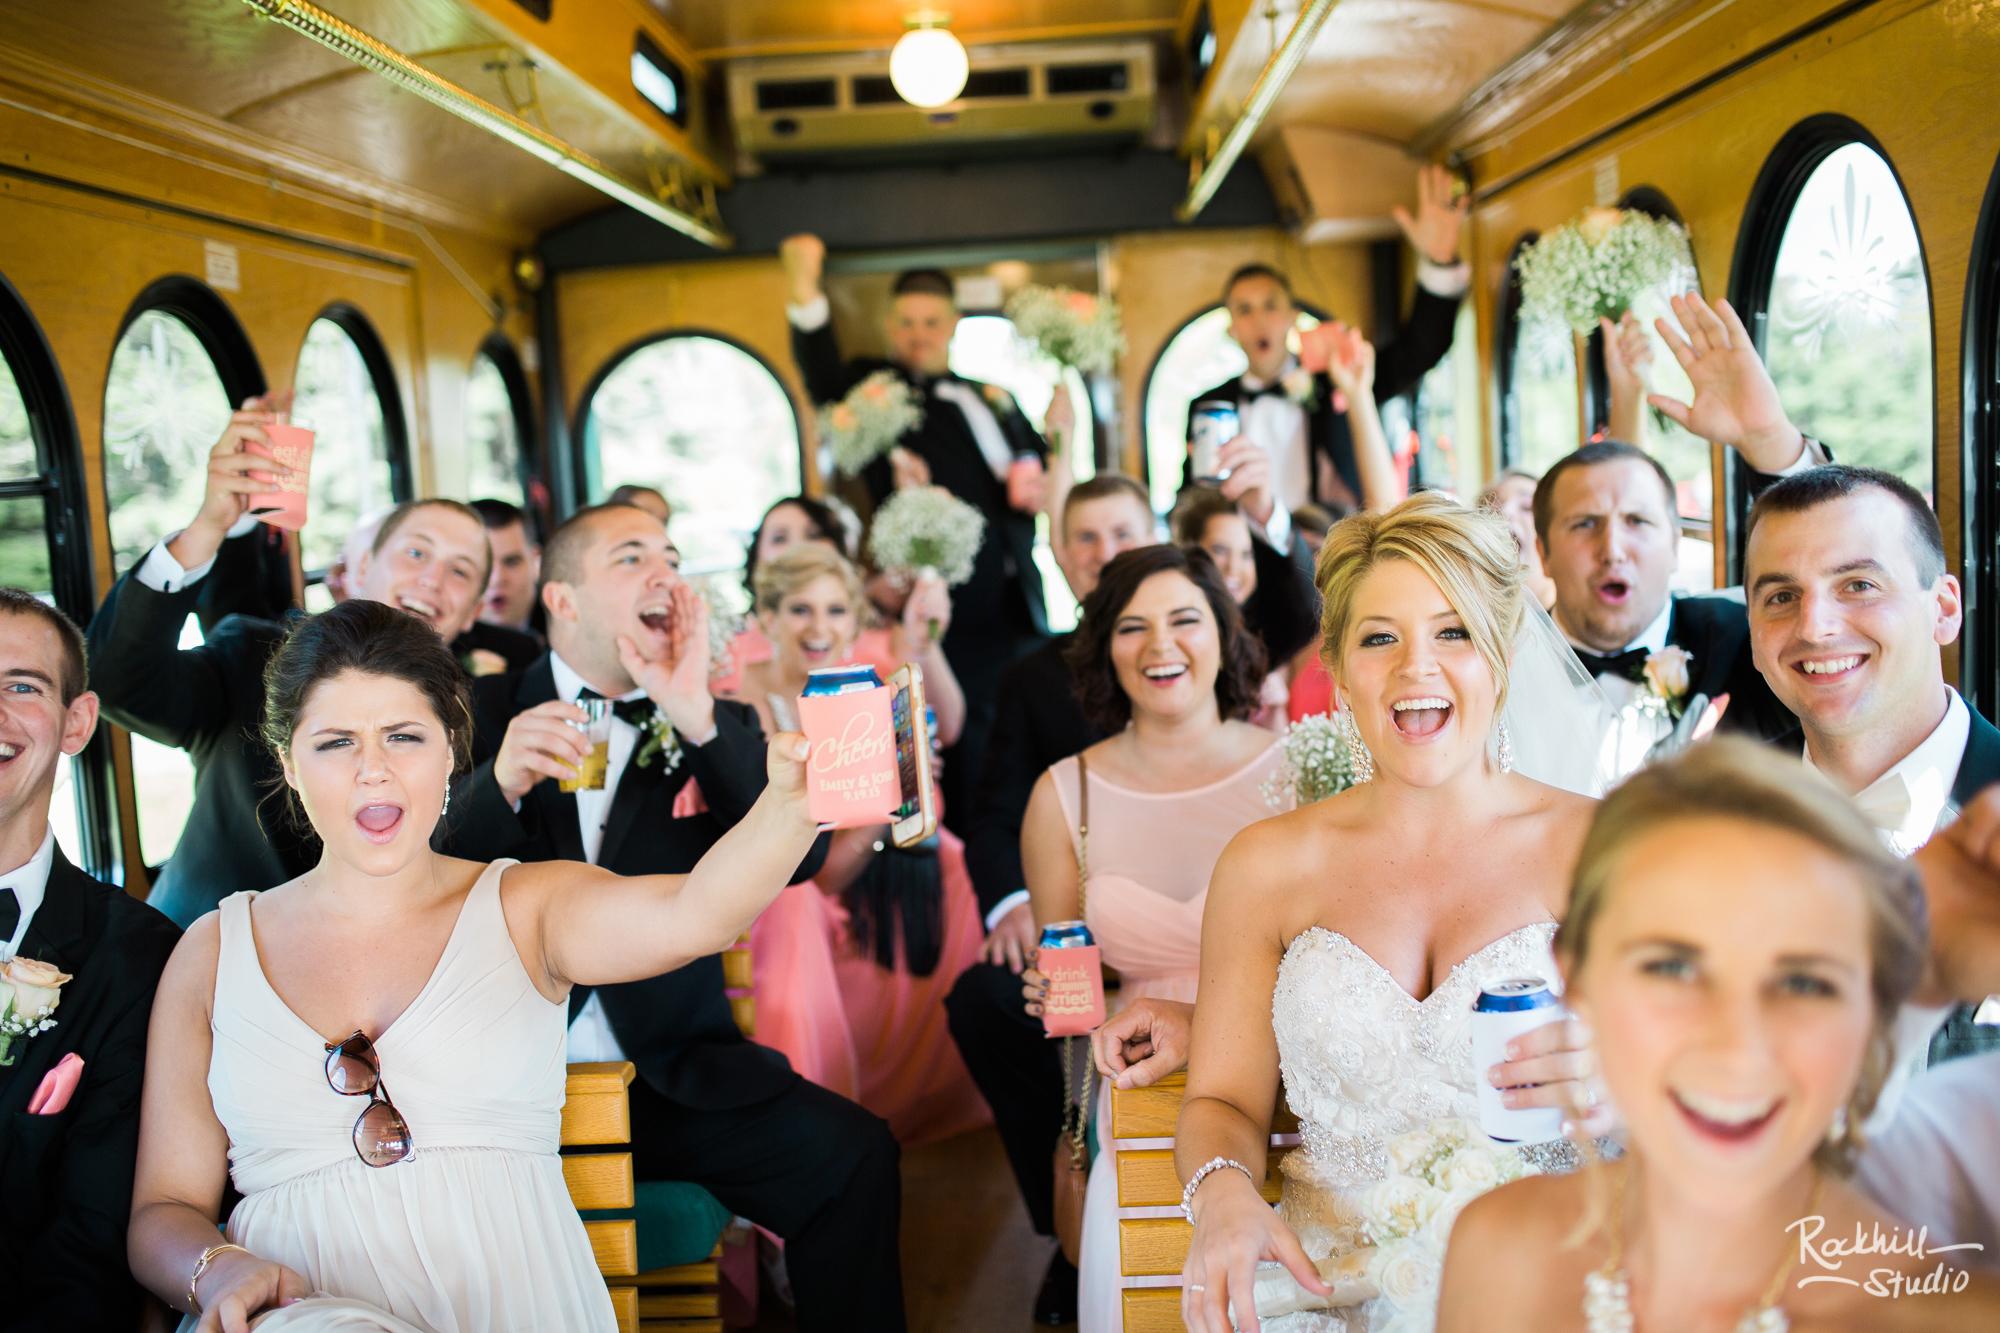 rockhill-studio-newberry-michigan-wedding-upper-peninsula-party-bus-marquette-wedding.jpg